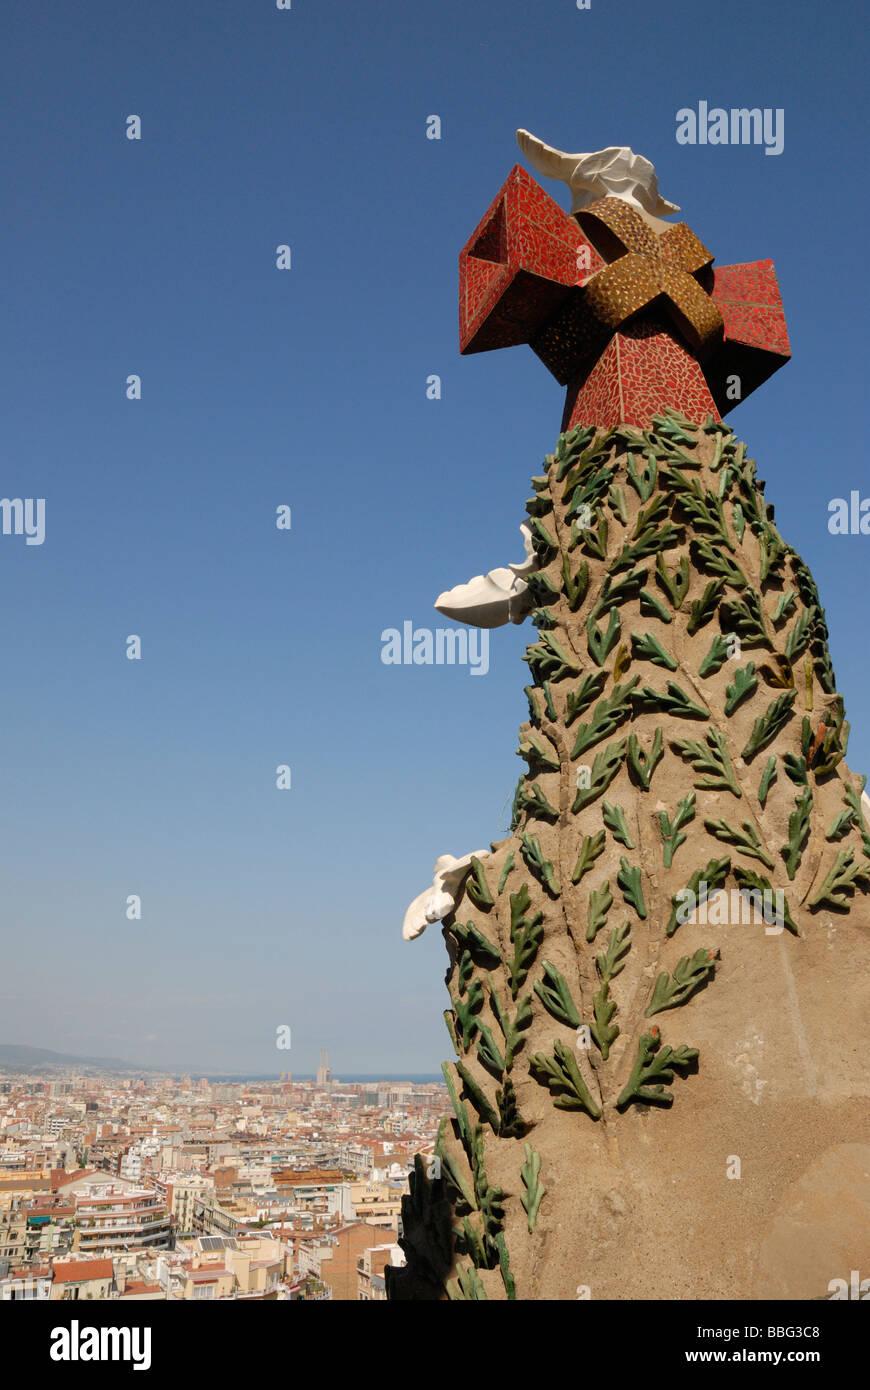 Segrada Familiar, Barcelona spain - Stock Image